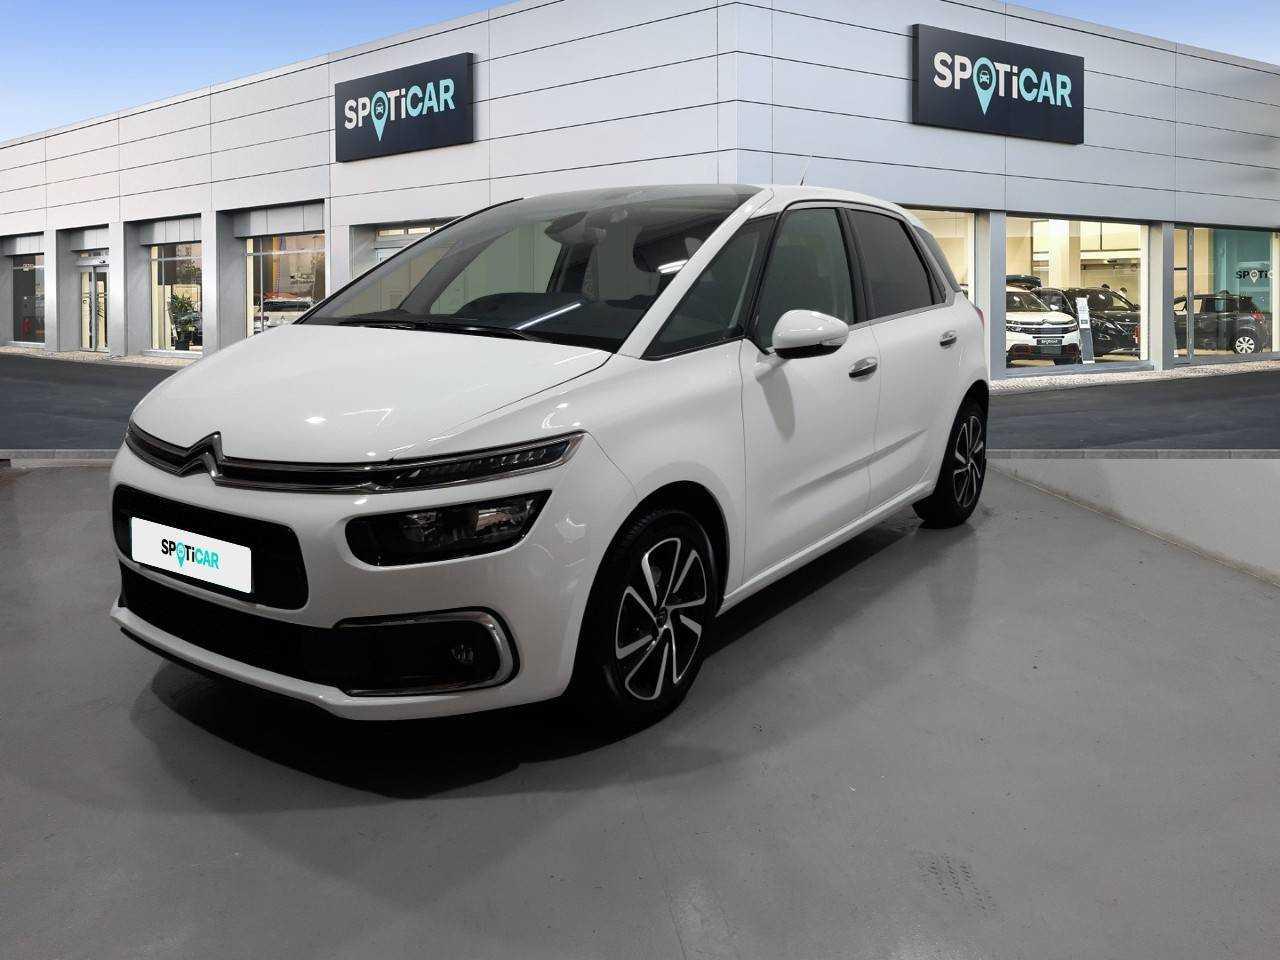 Citroën C4 Picasso ocasión segunda mano 2017 Diésel por 15.950€ en Barcelona